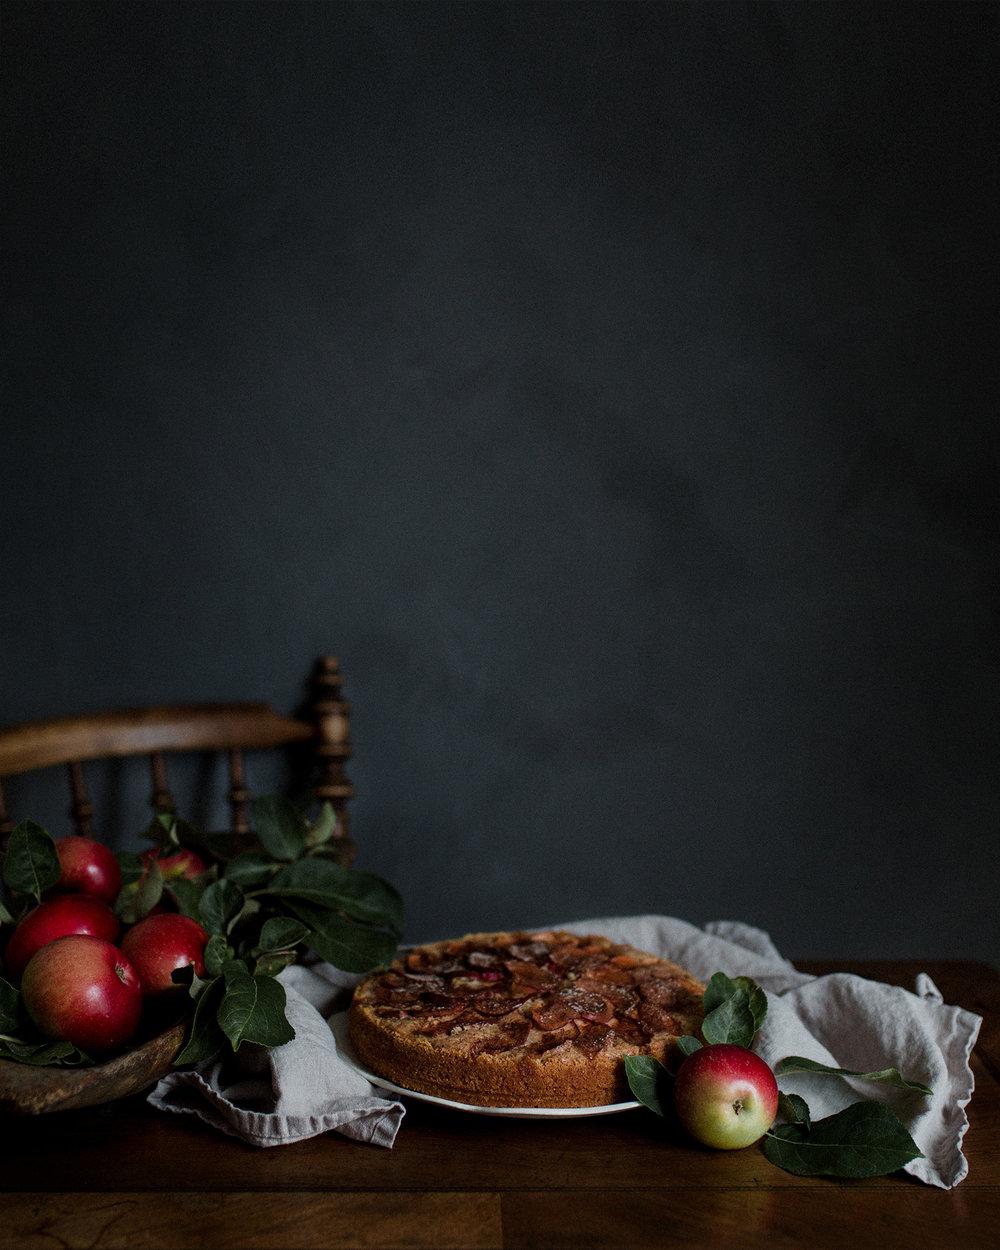 apple_cake_01.jpg